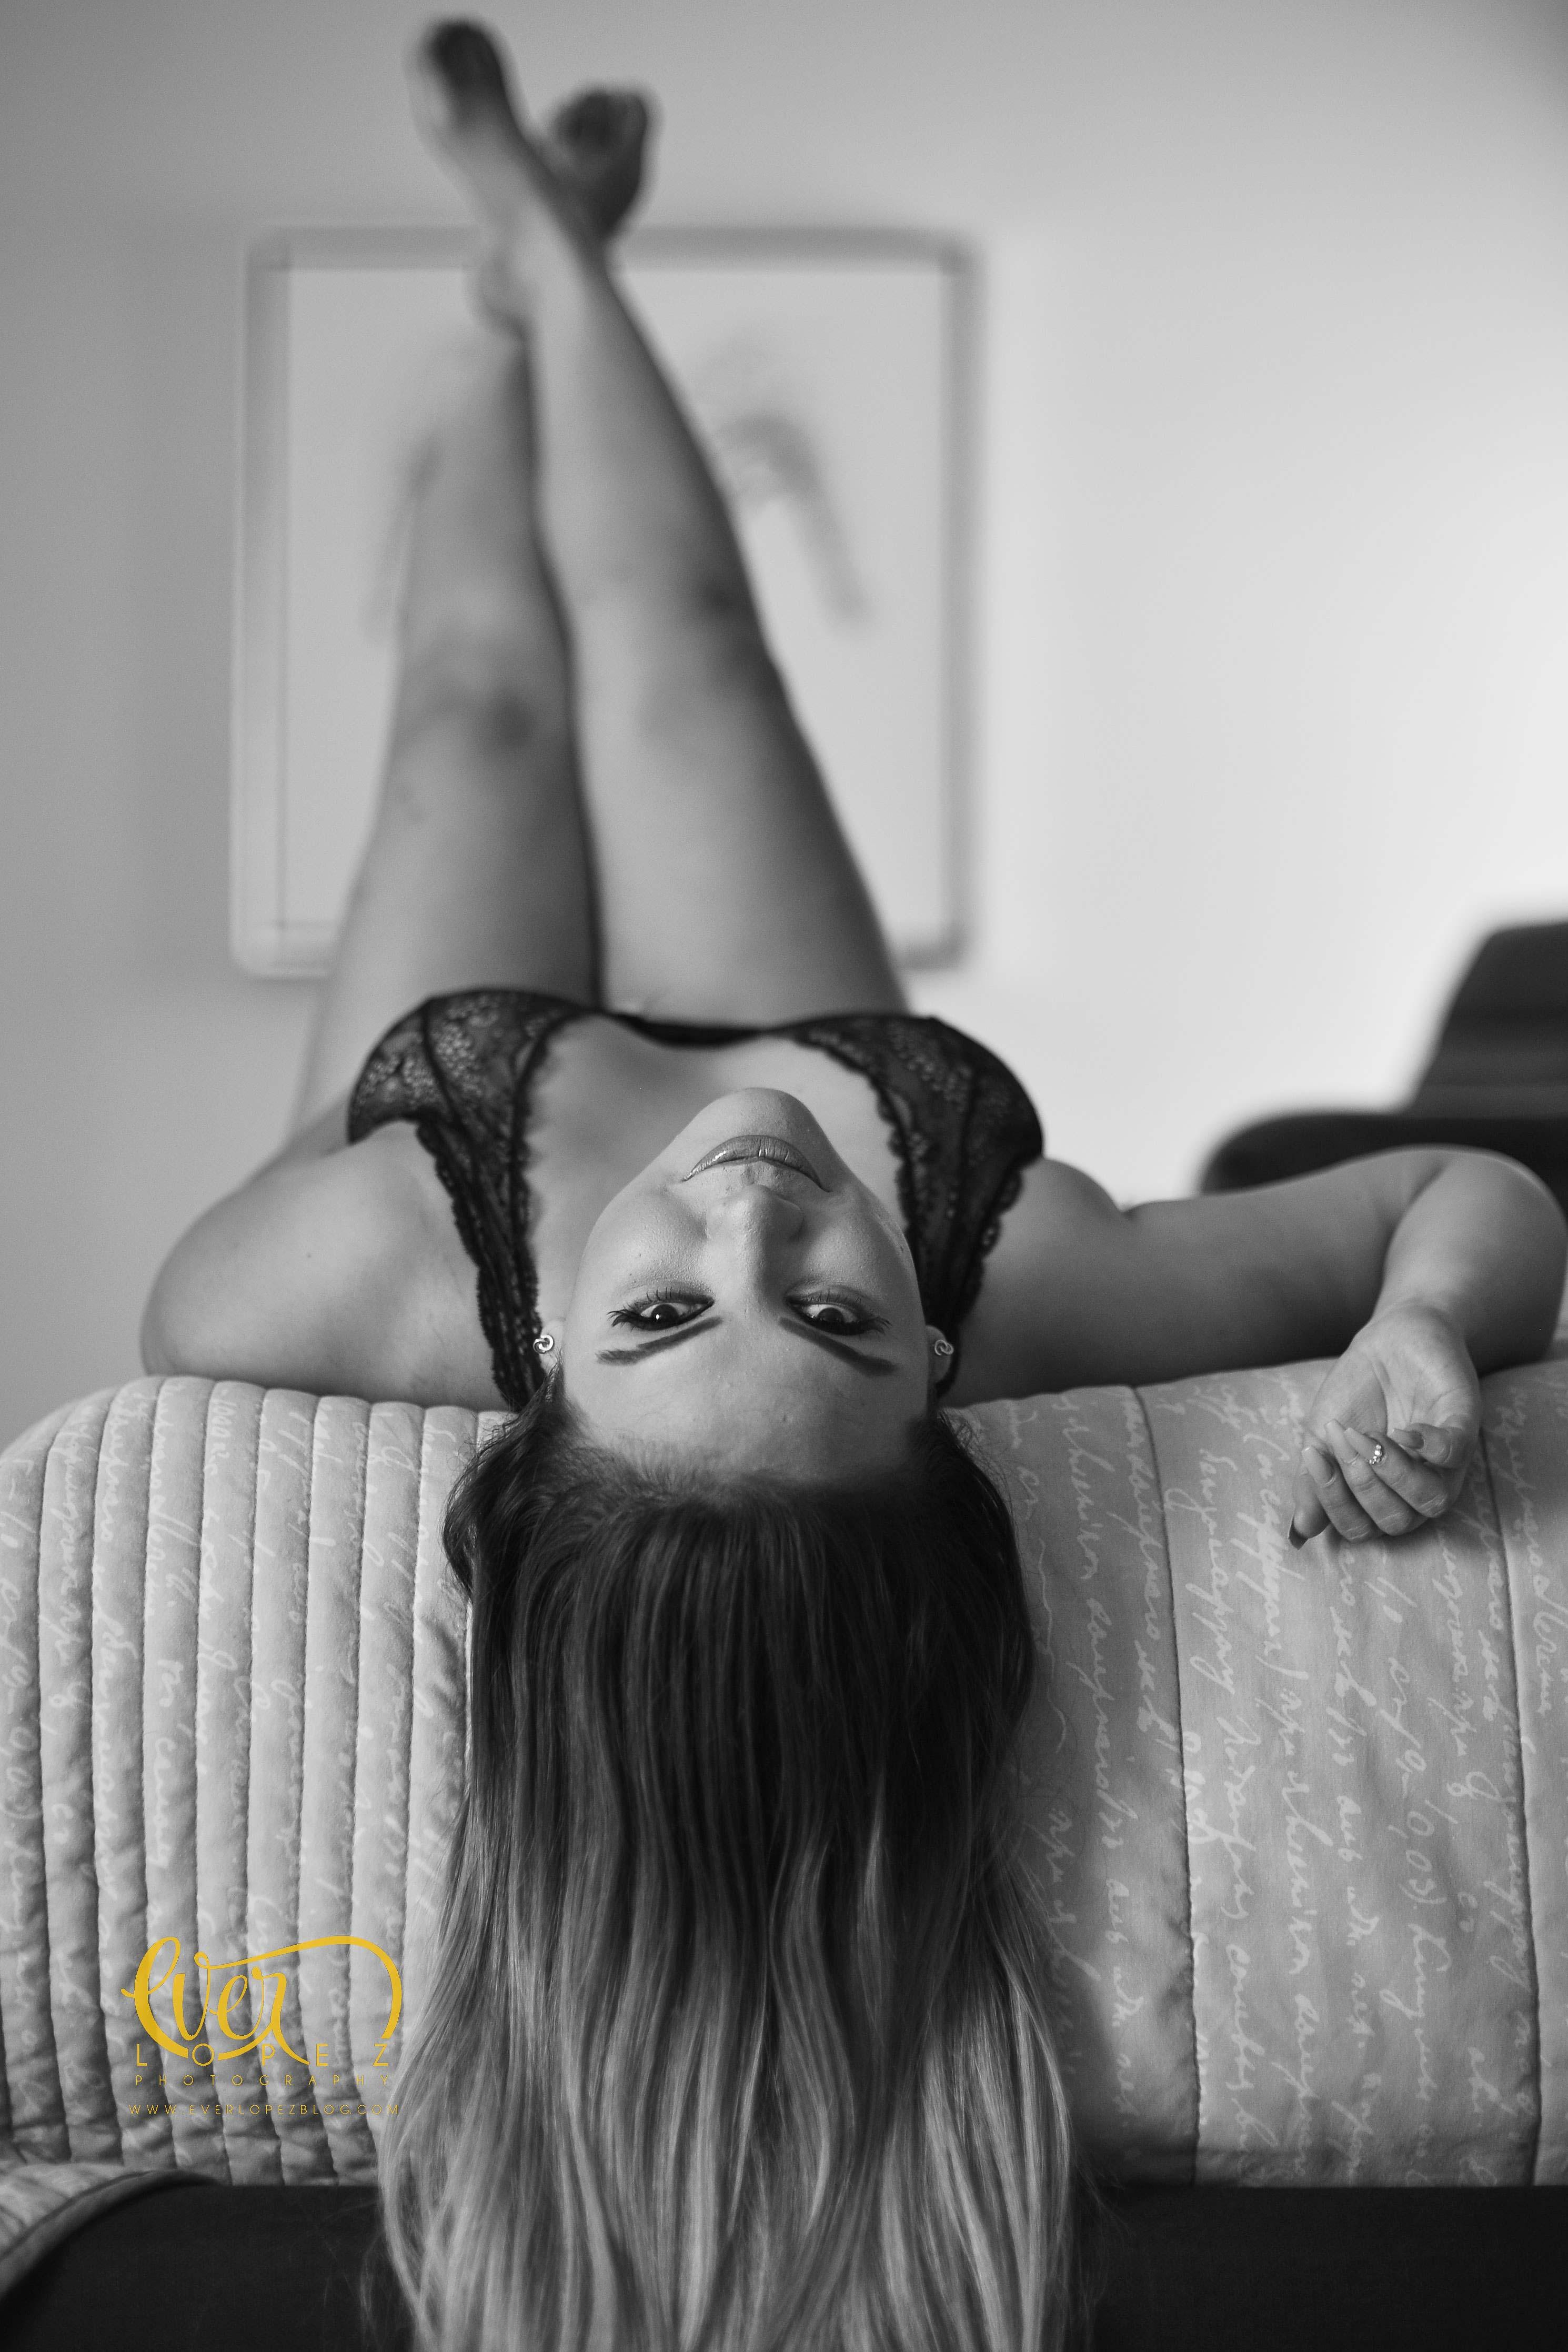 fotografos en Guadalajara especializados en fotografia boudoir en lenceria Mexico